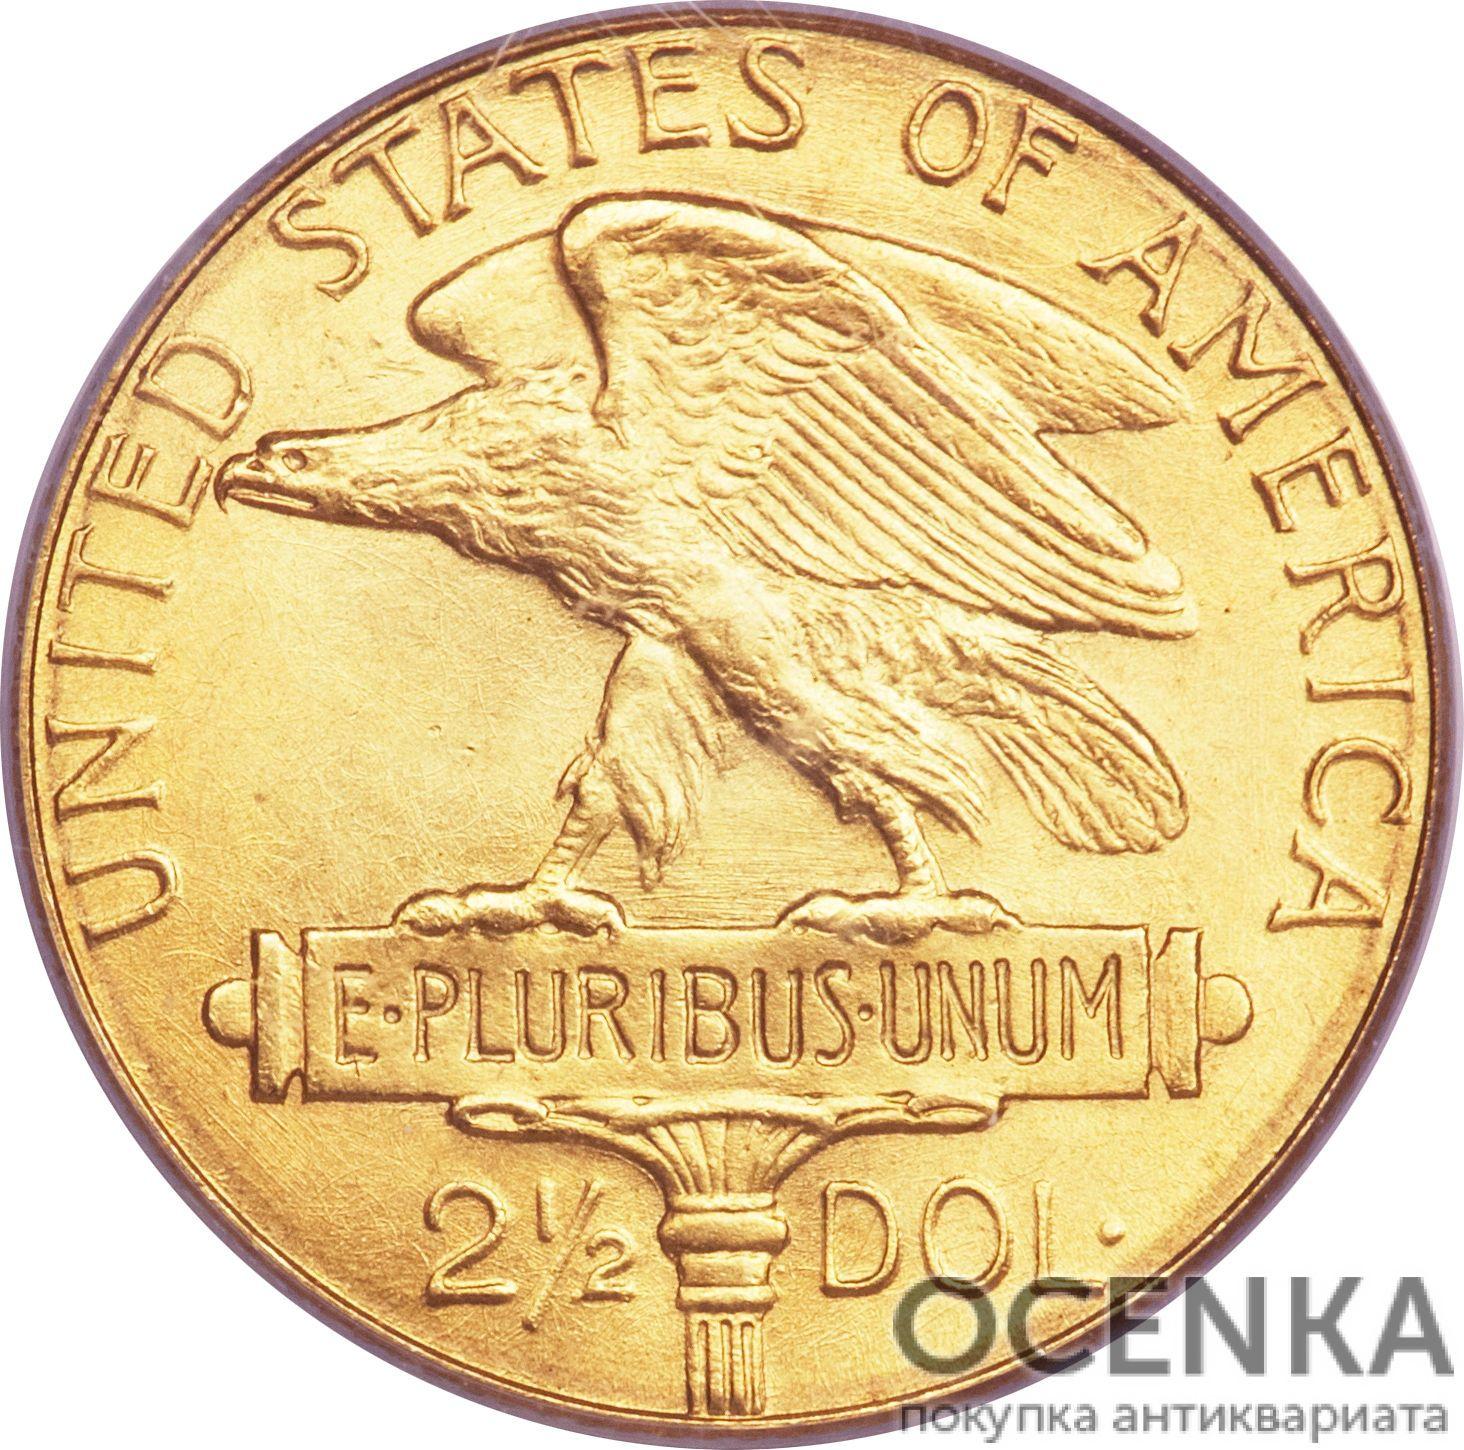 Золотая монета 2½ Dollars (2,5 доллара) США - 8